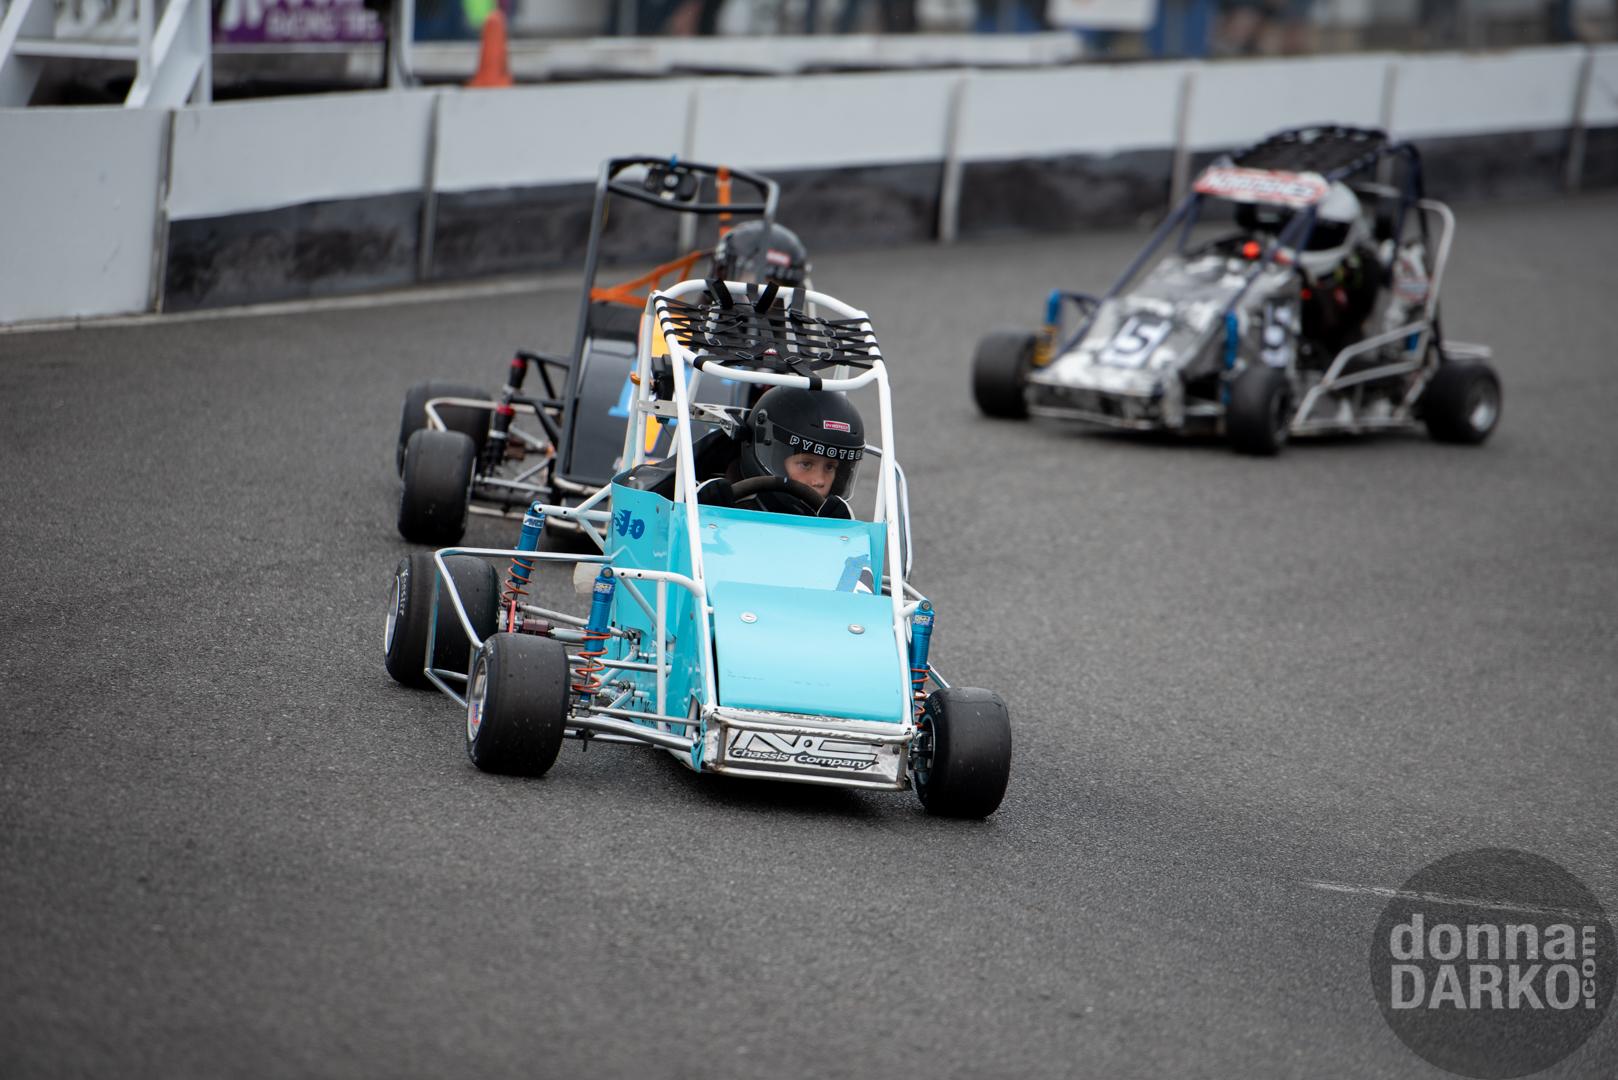 QWMA (Racing) 8-11-2019 DSC_5998.jpg